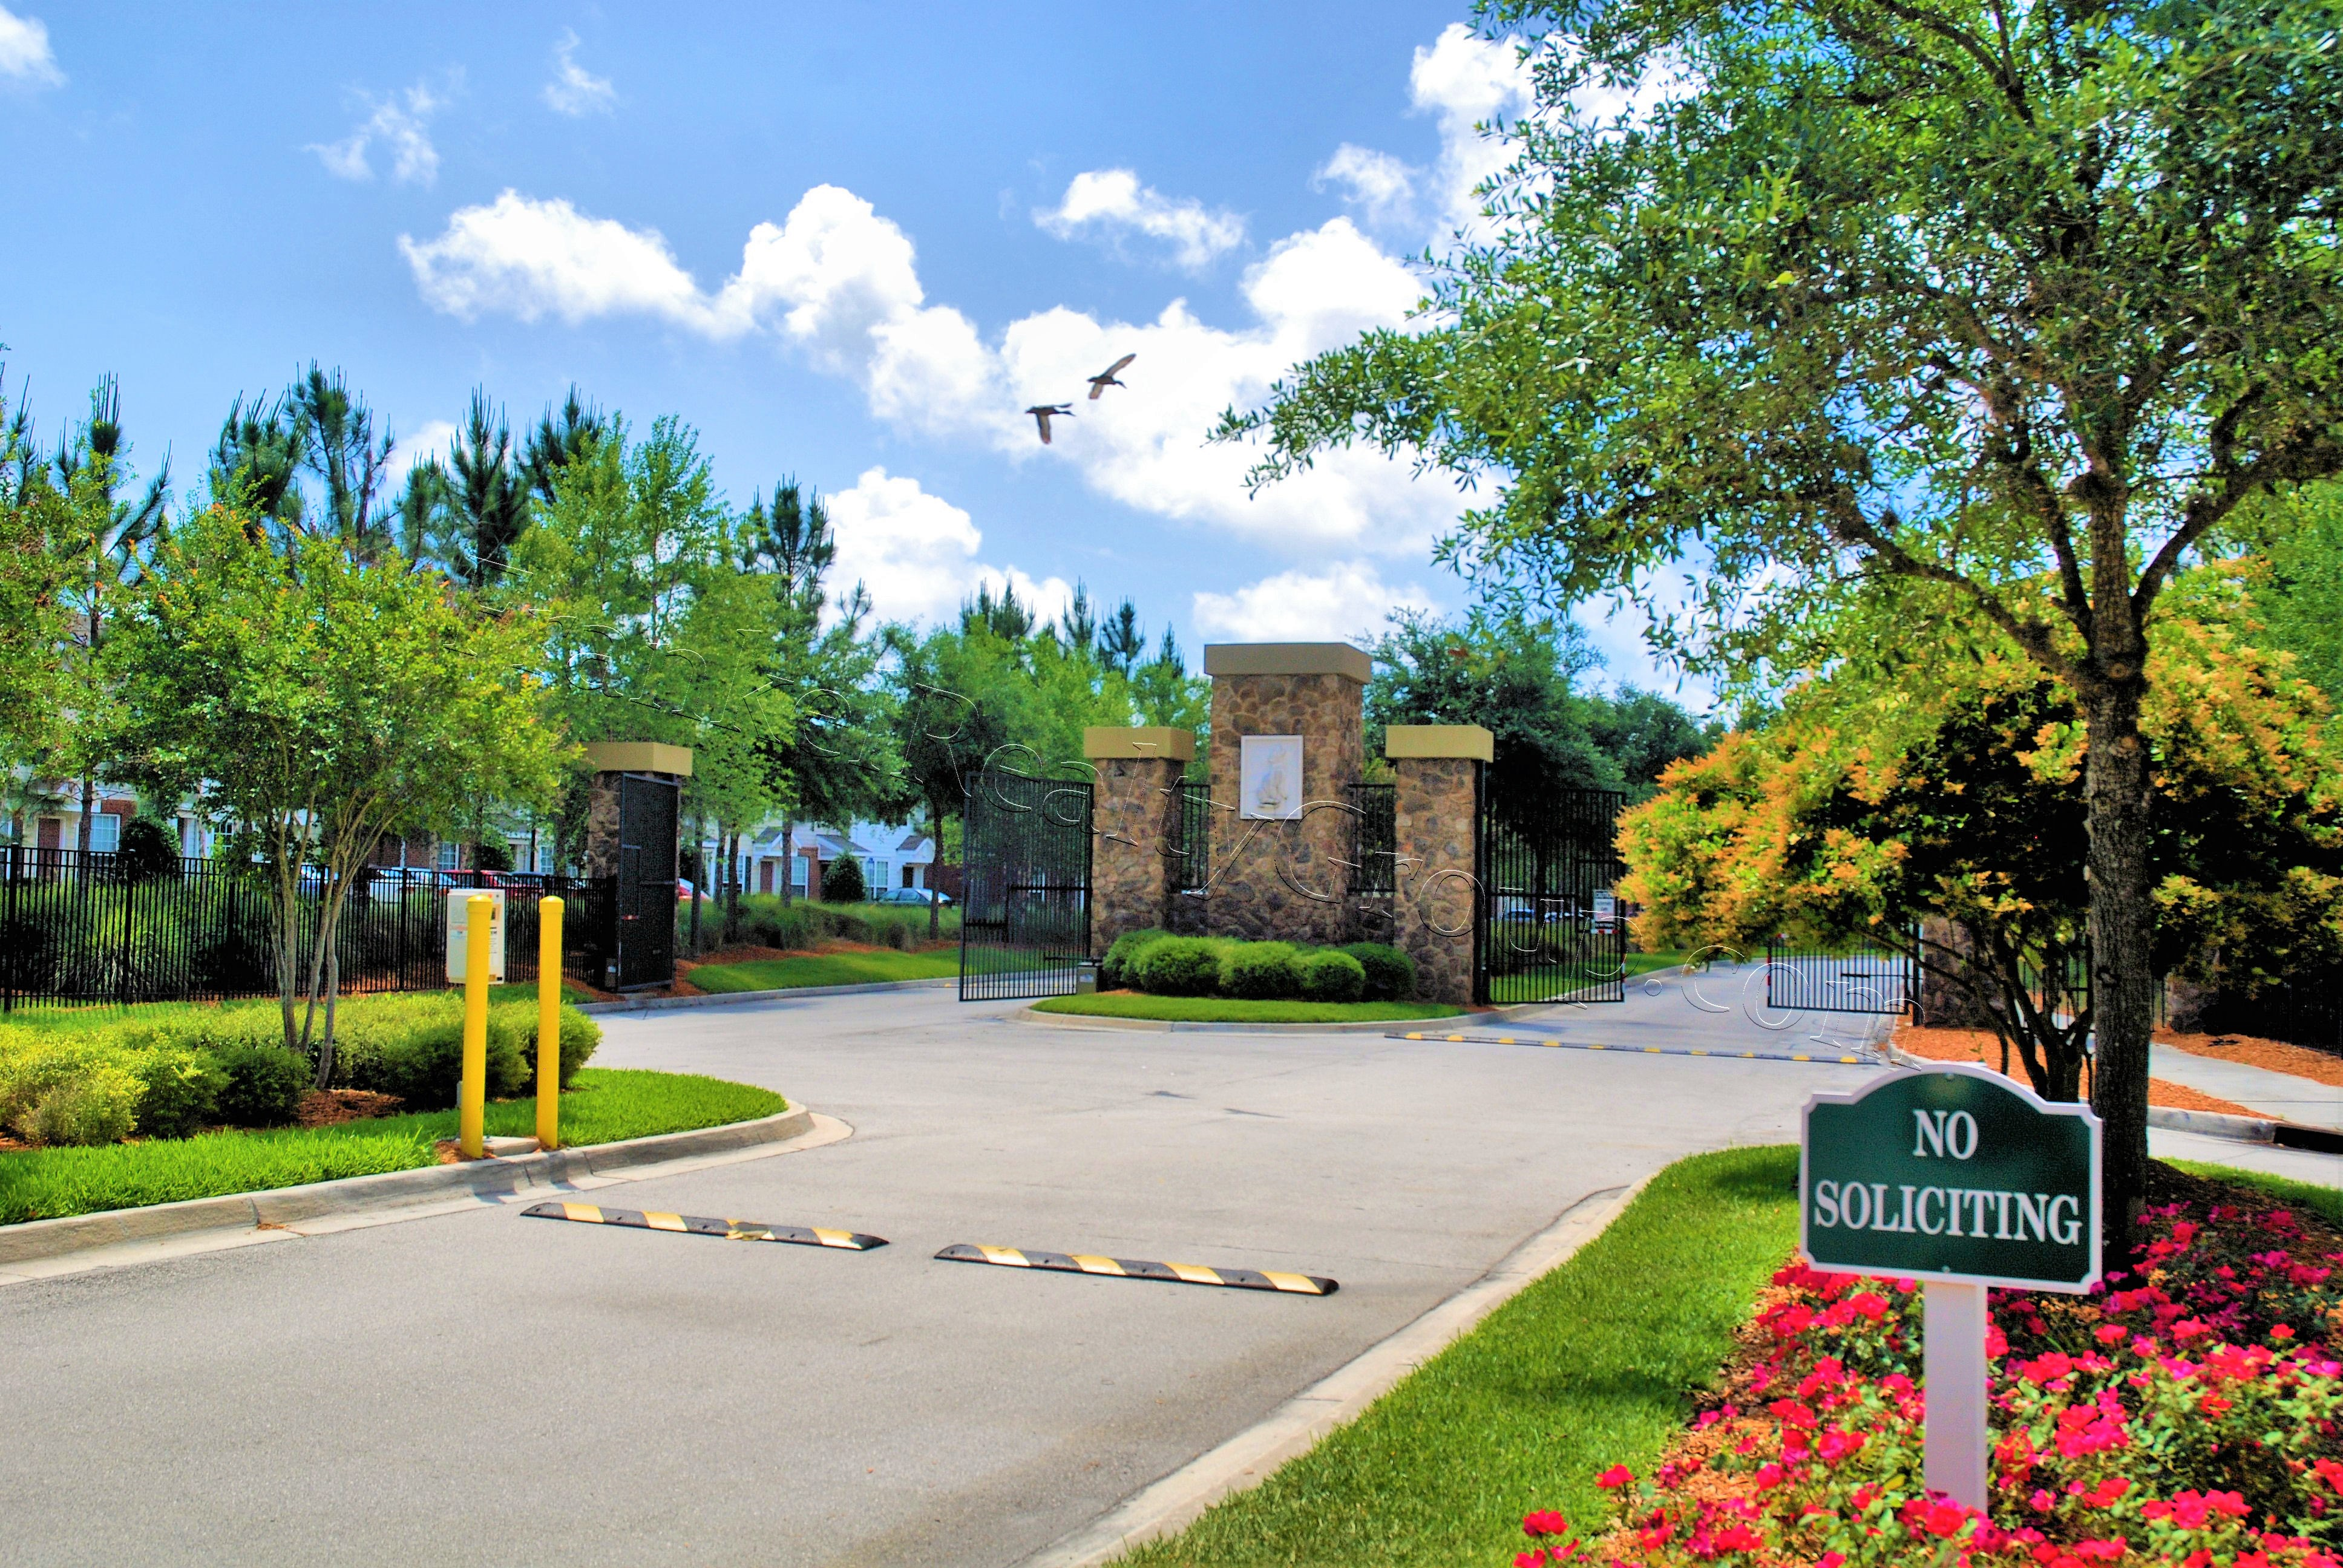 Sensational Wolf Creek Townhomes For Sale Jacksonville Florida 32224 Interior Design Ideas Tzicisoteloinfo